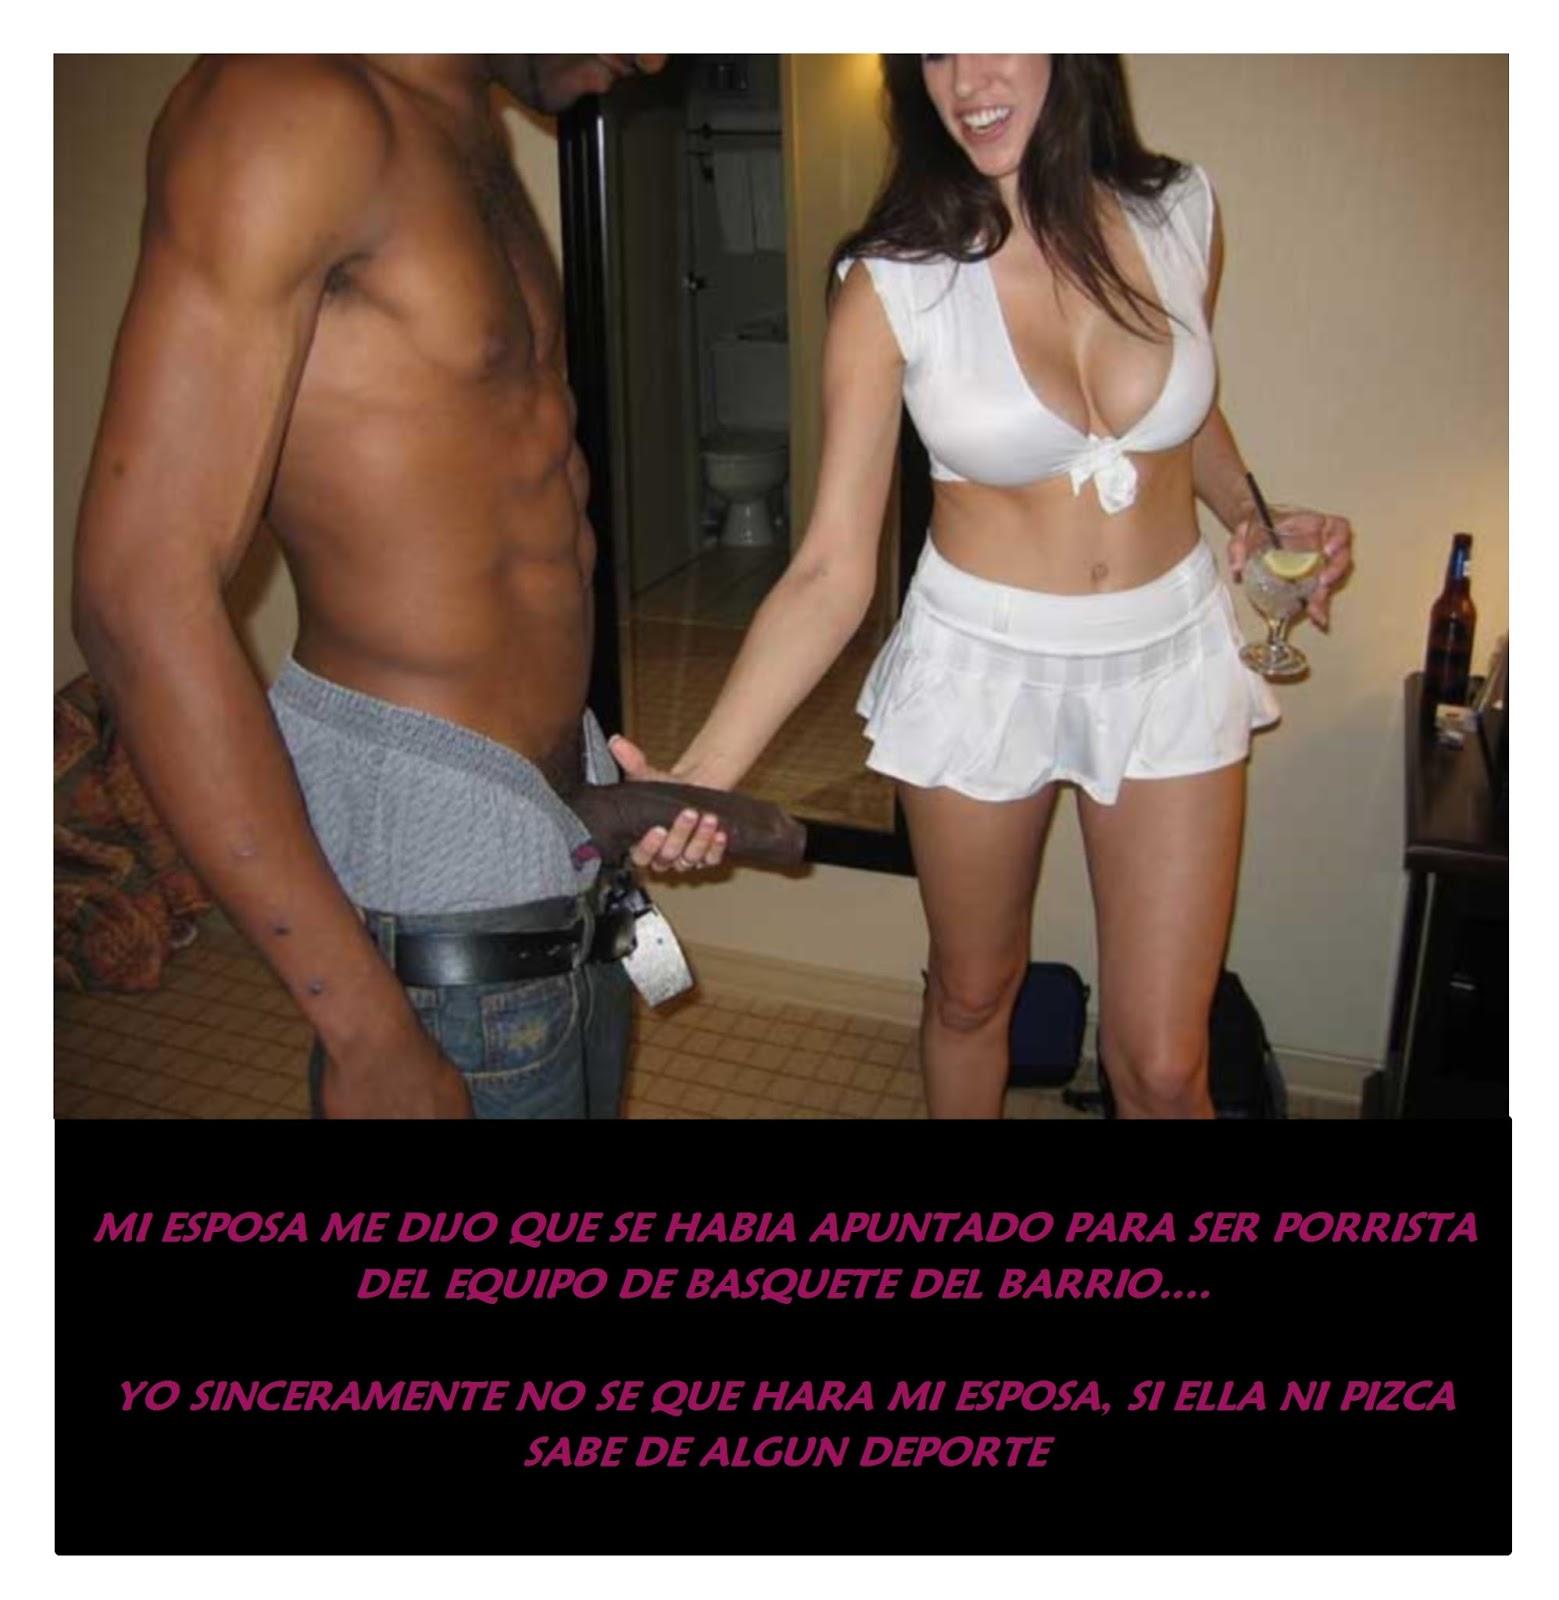 prostitutas en guadalajara españa prostitutas elizabeth nj